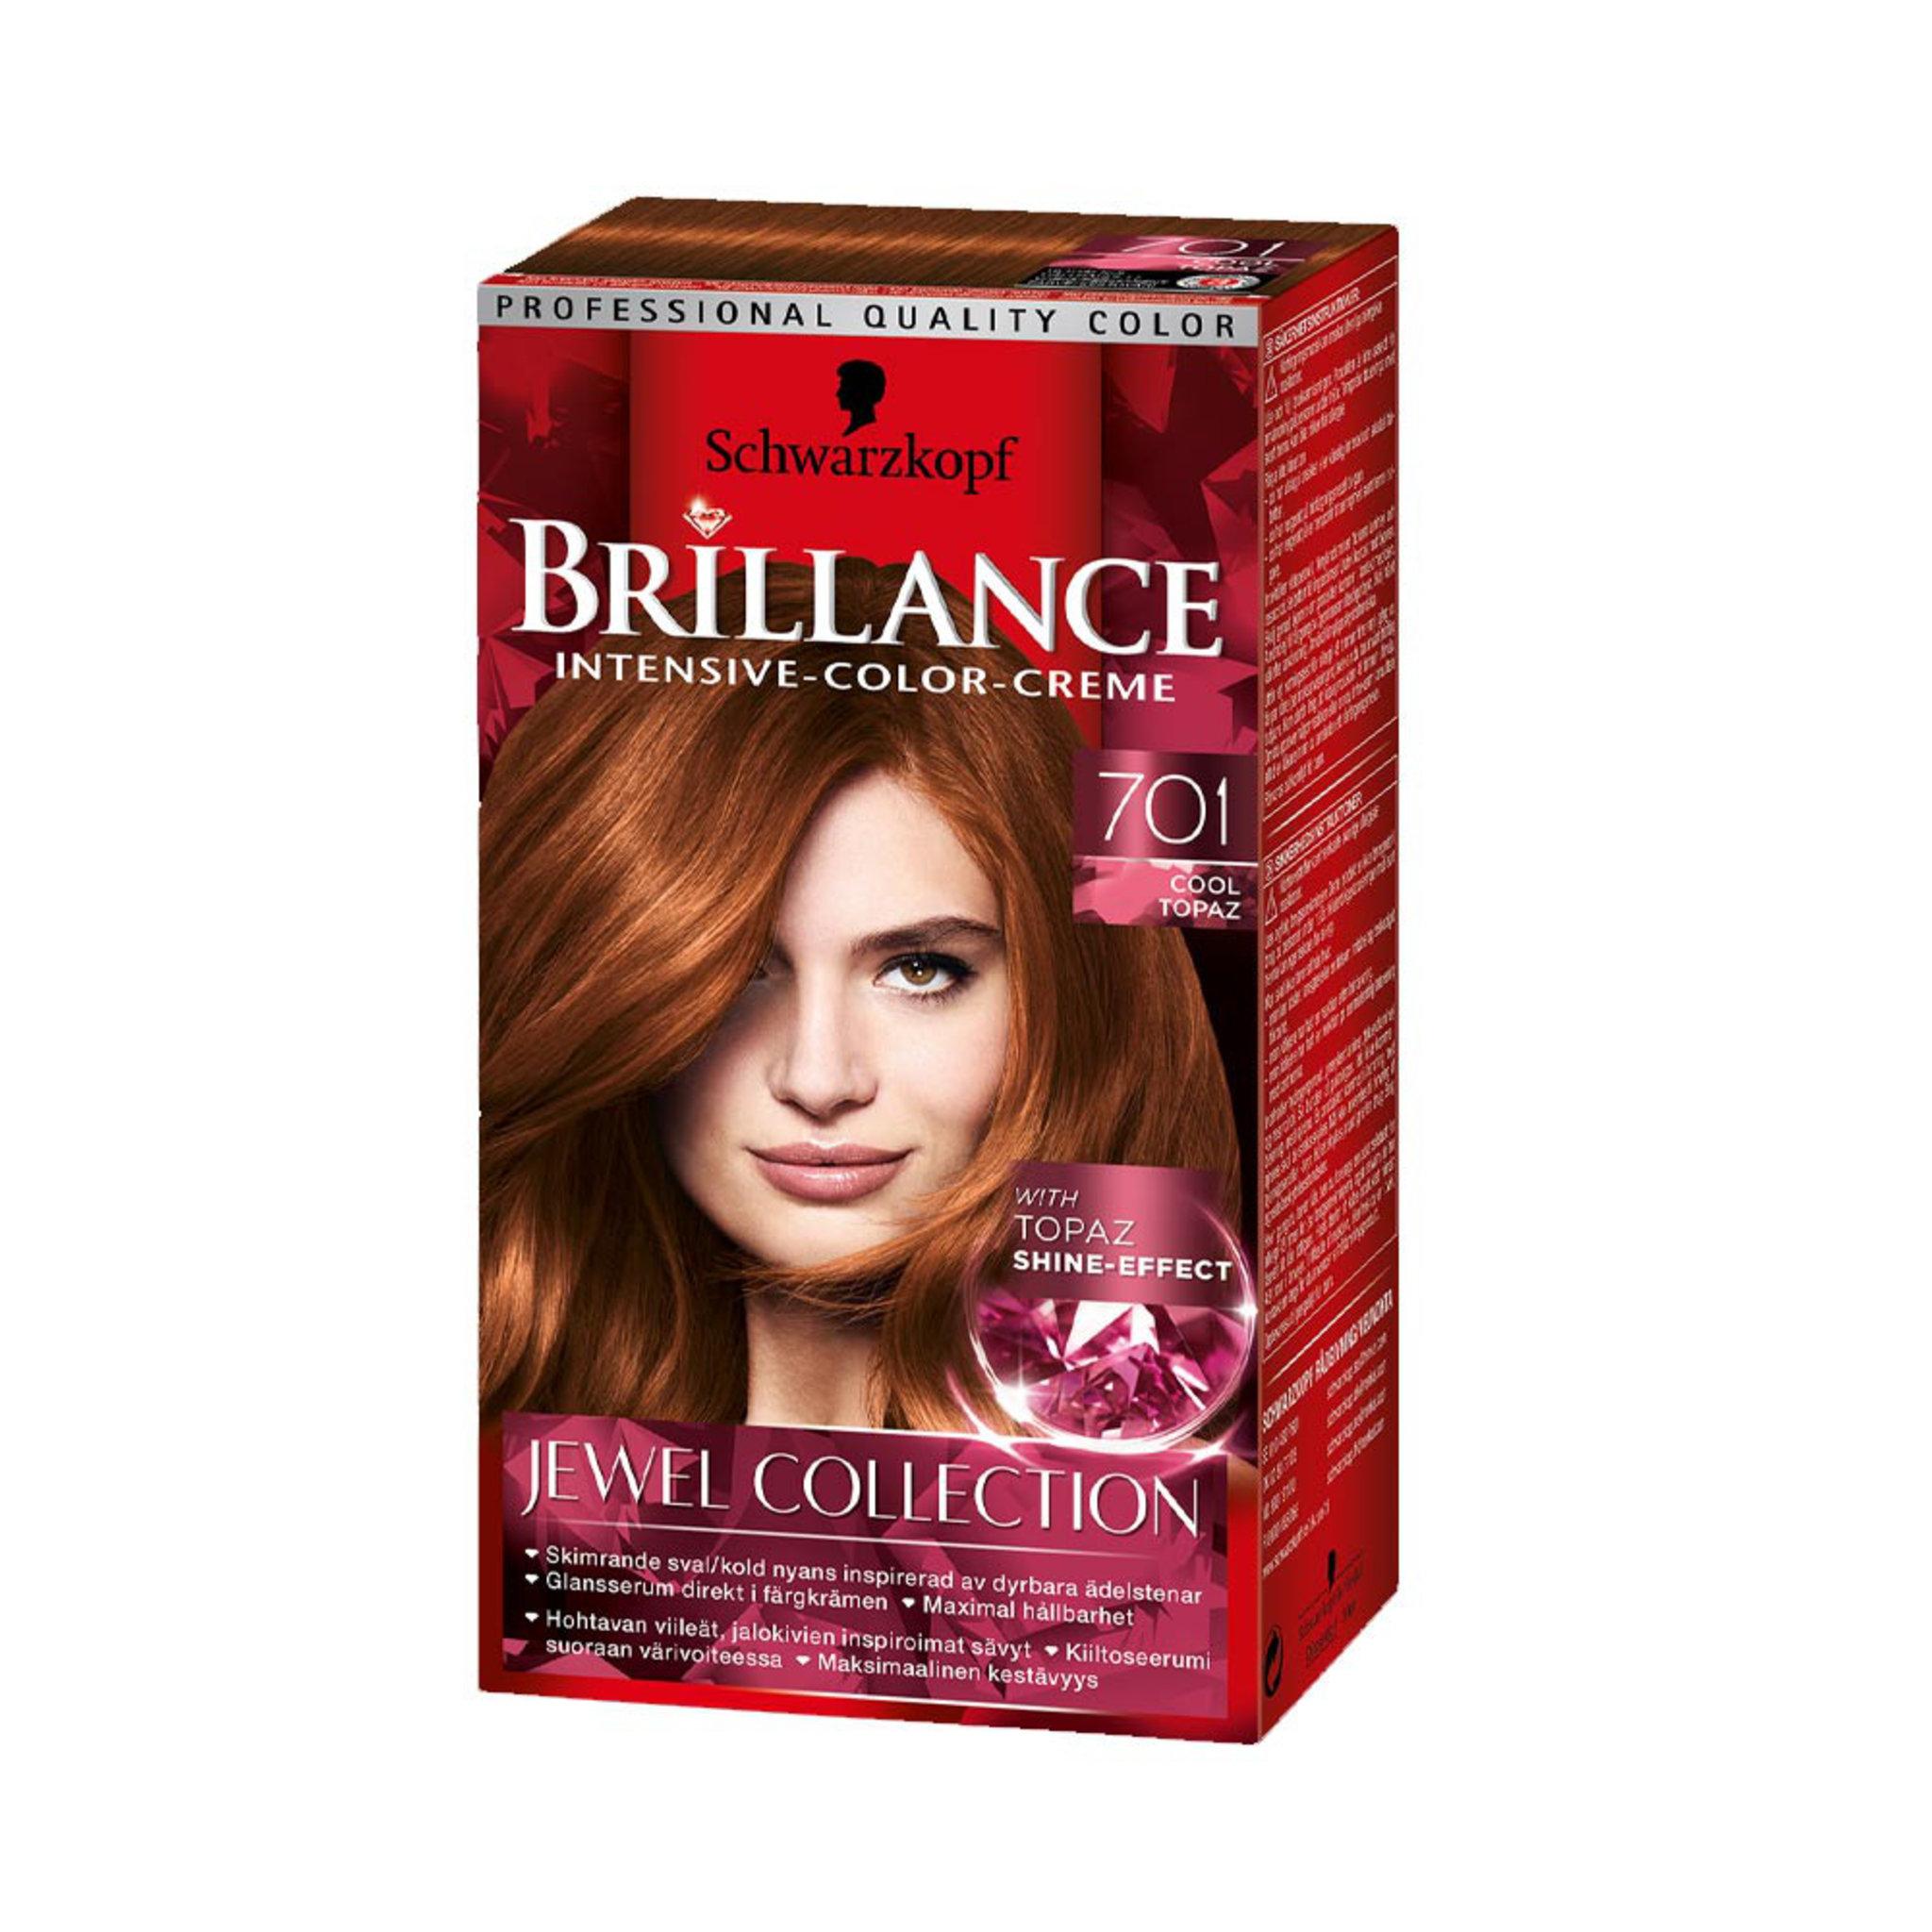 Brillance Jewel Collection - 701 Cool Topaz